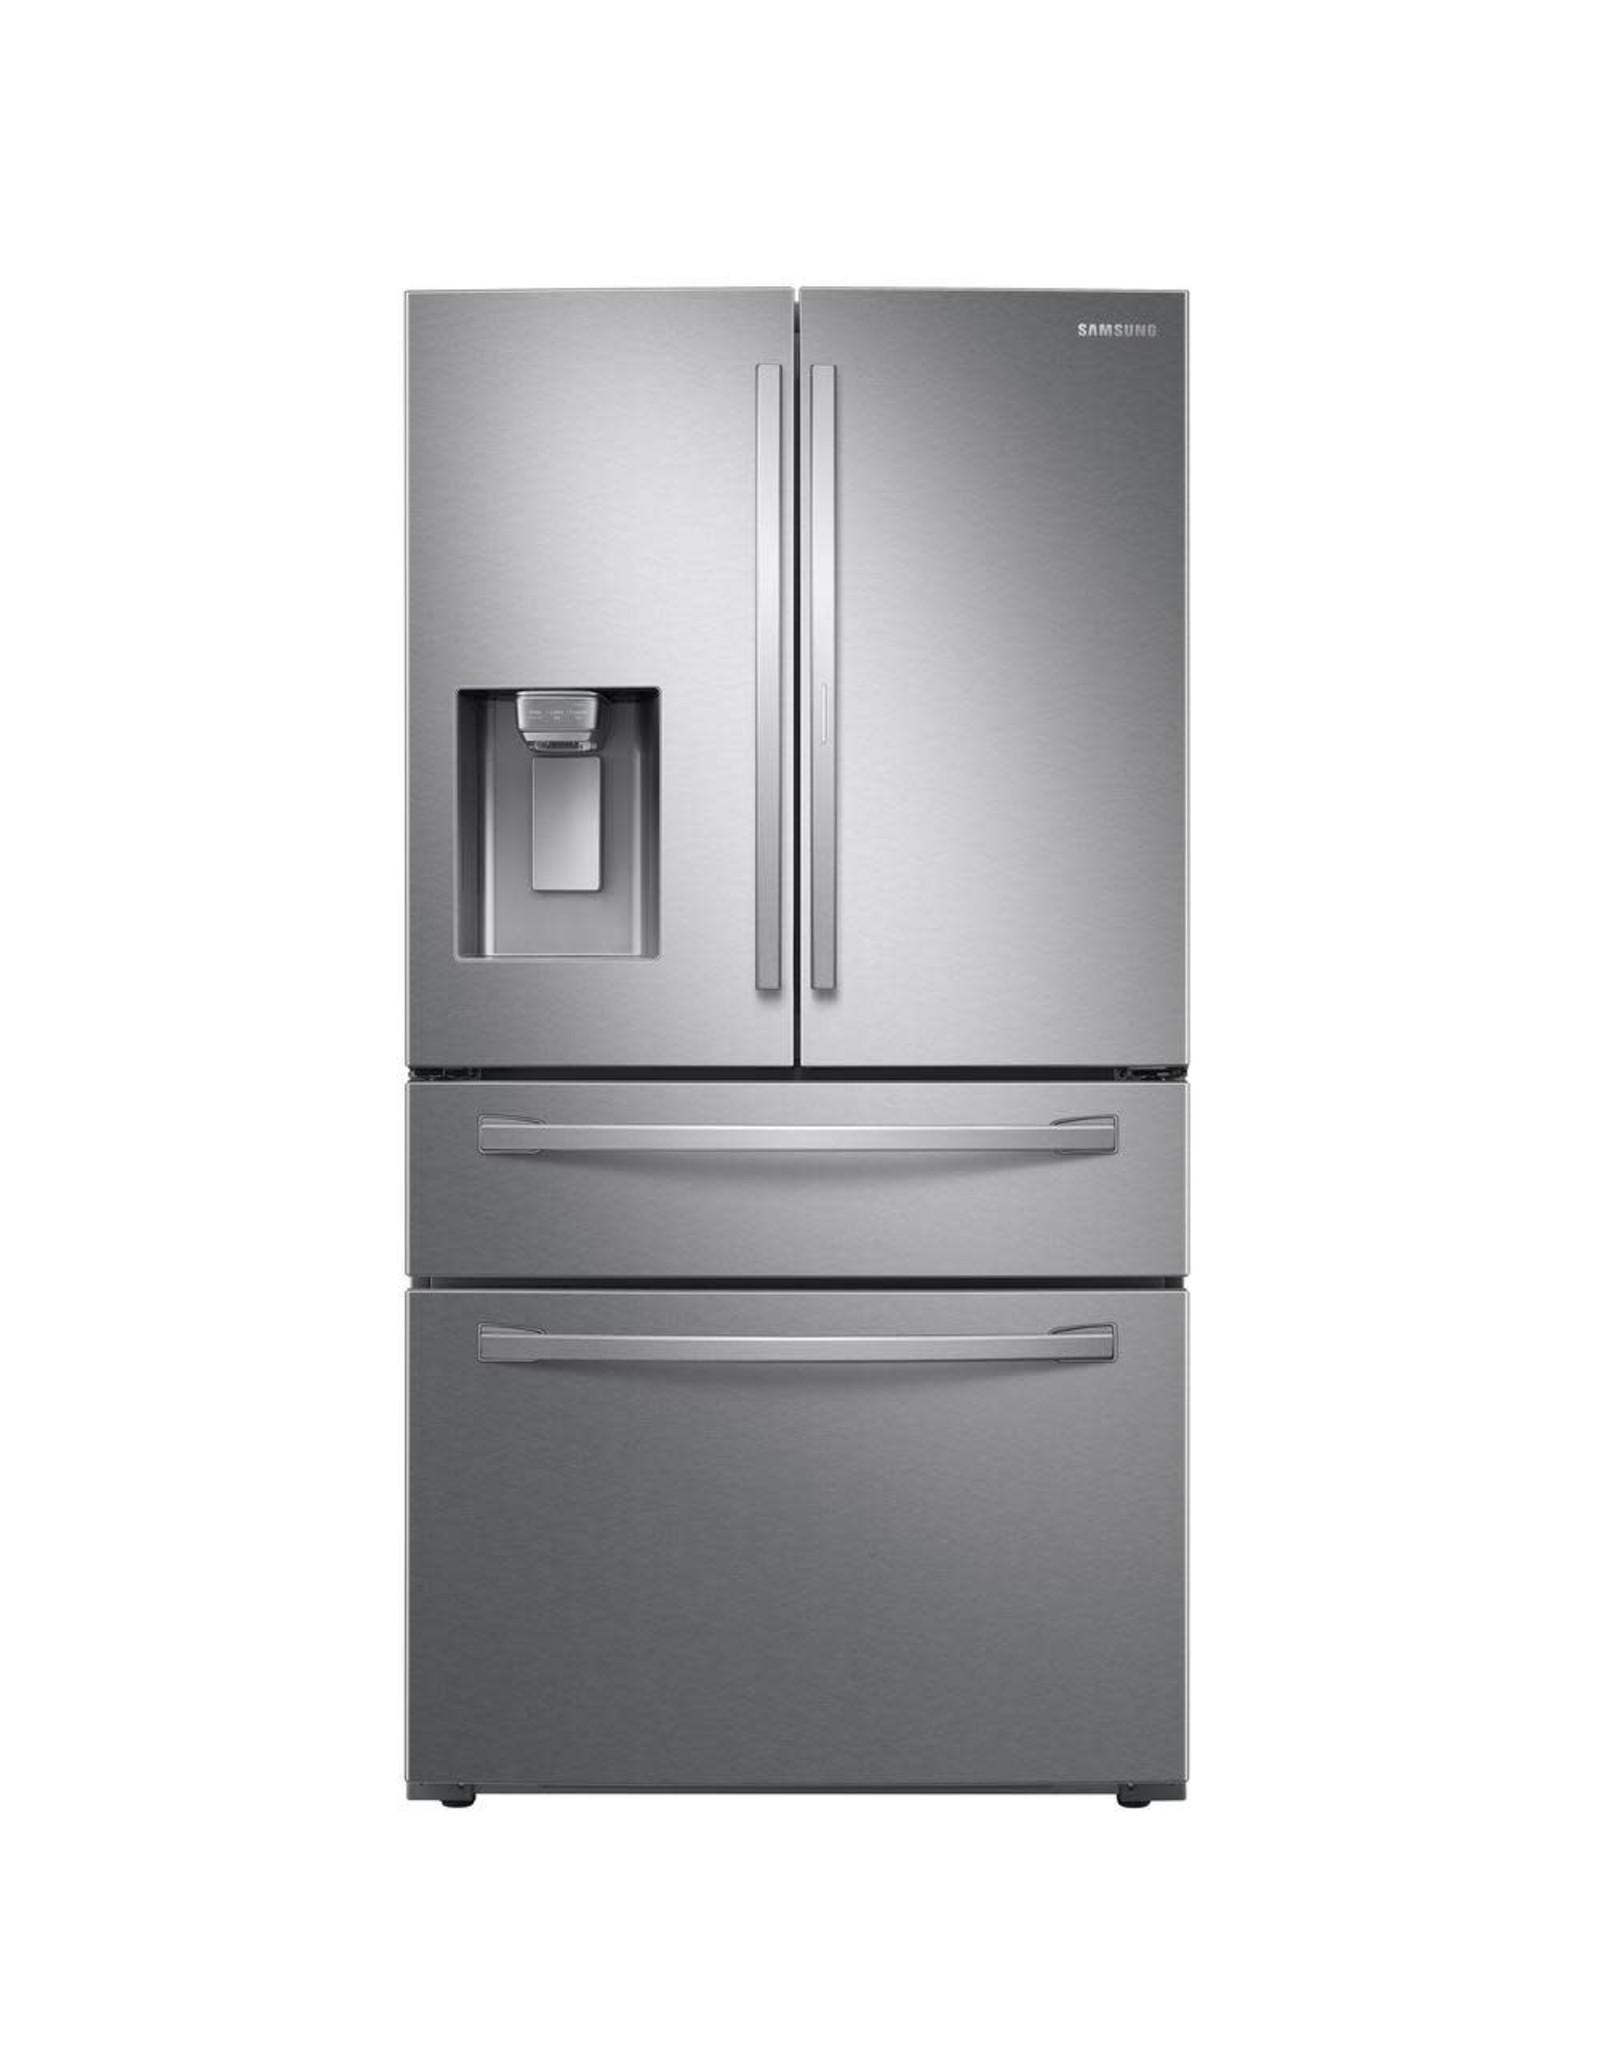 SAMSUNG RF28R7351SR  Samsung food showcase 28 cu.ft 4- D French-D refrigerator with ice maker